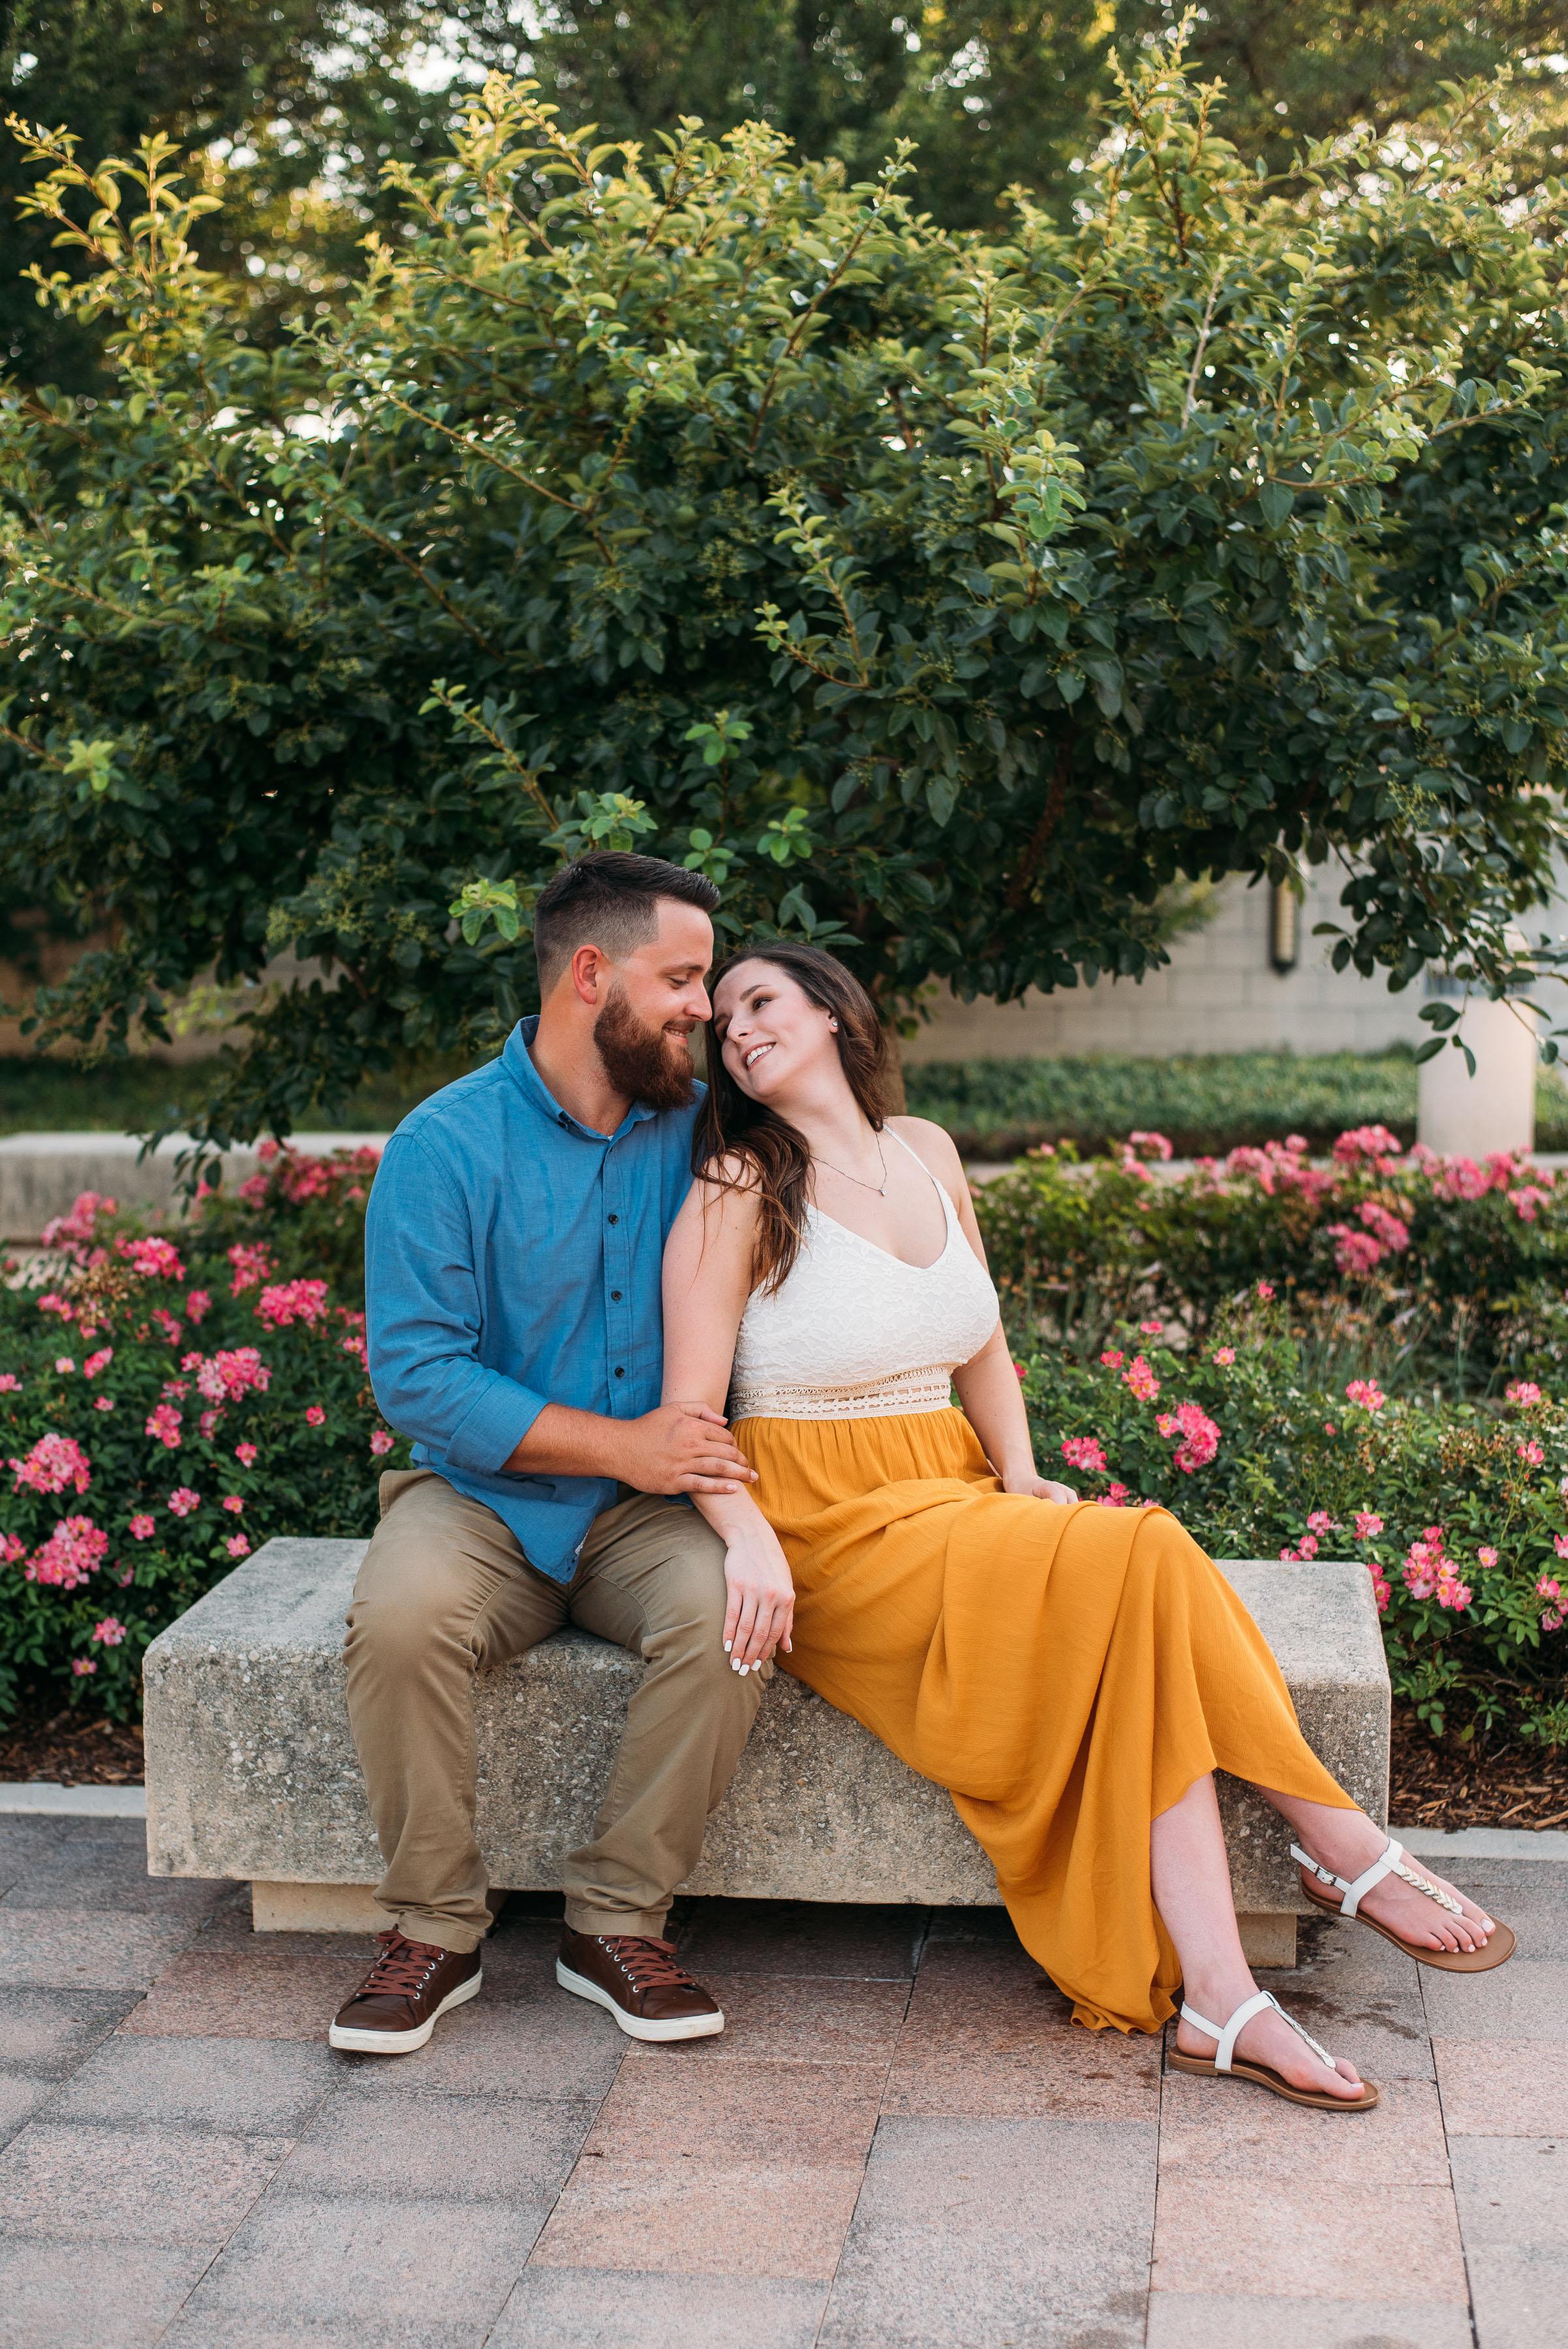 George-Bush-Library-Texas-A&M-University-Engagement-College-Station-Wedding-Photographer-San-Angel-Photo-Mark-Jenna-Matt-Century-Tree-15.jpg